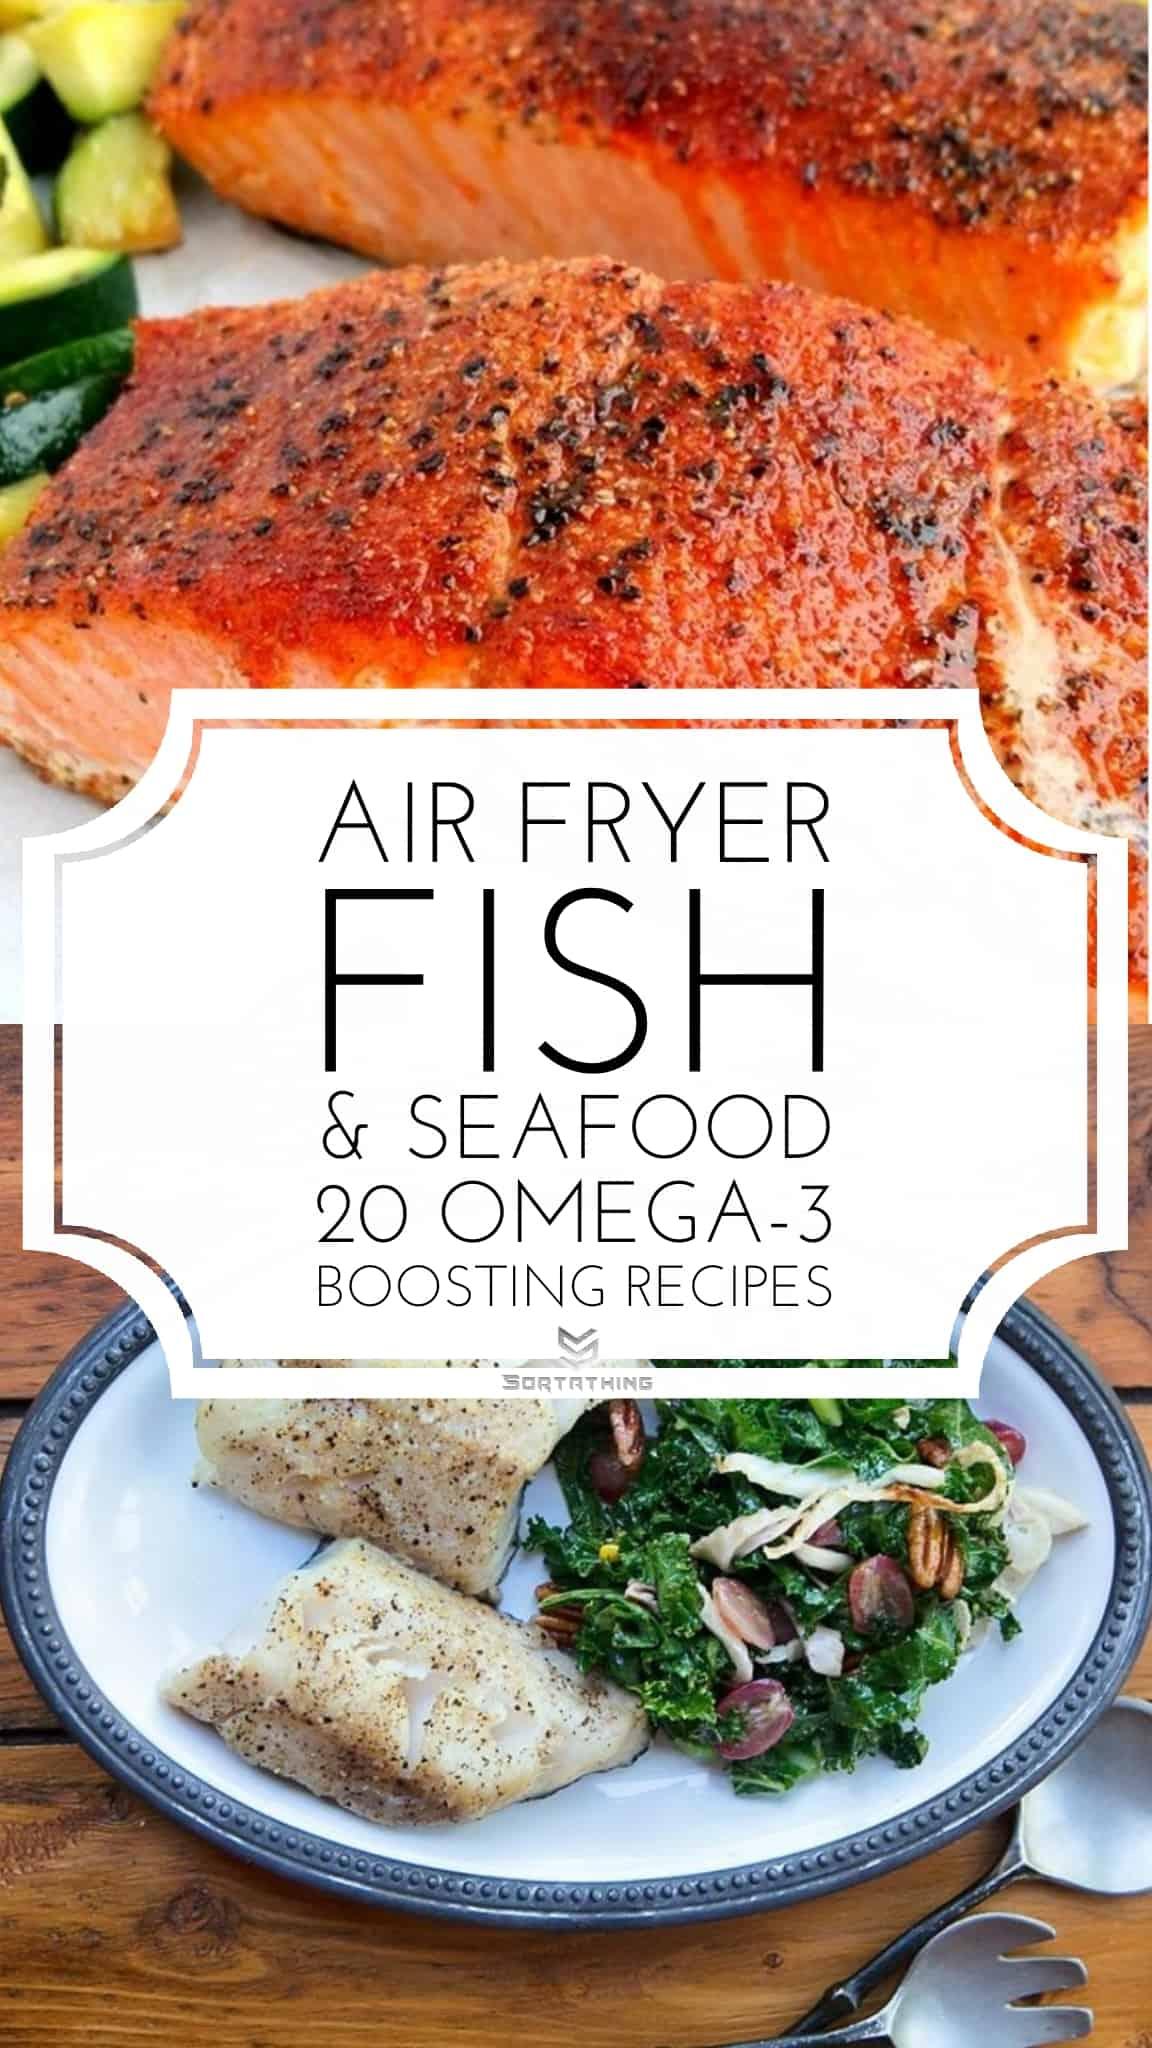 Perfect Air Fryer Salmon & Air Fryer Black Cod (Sablefish)